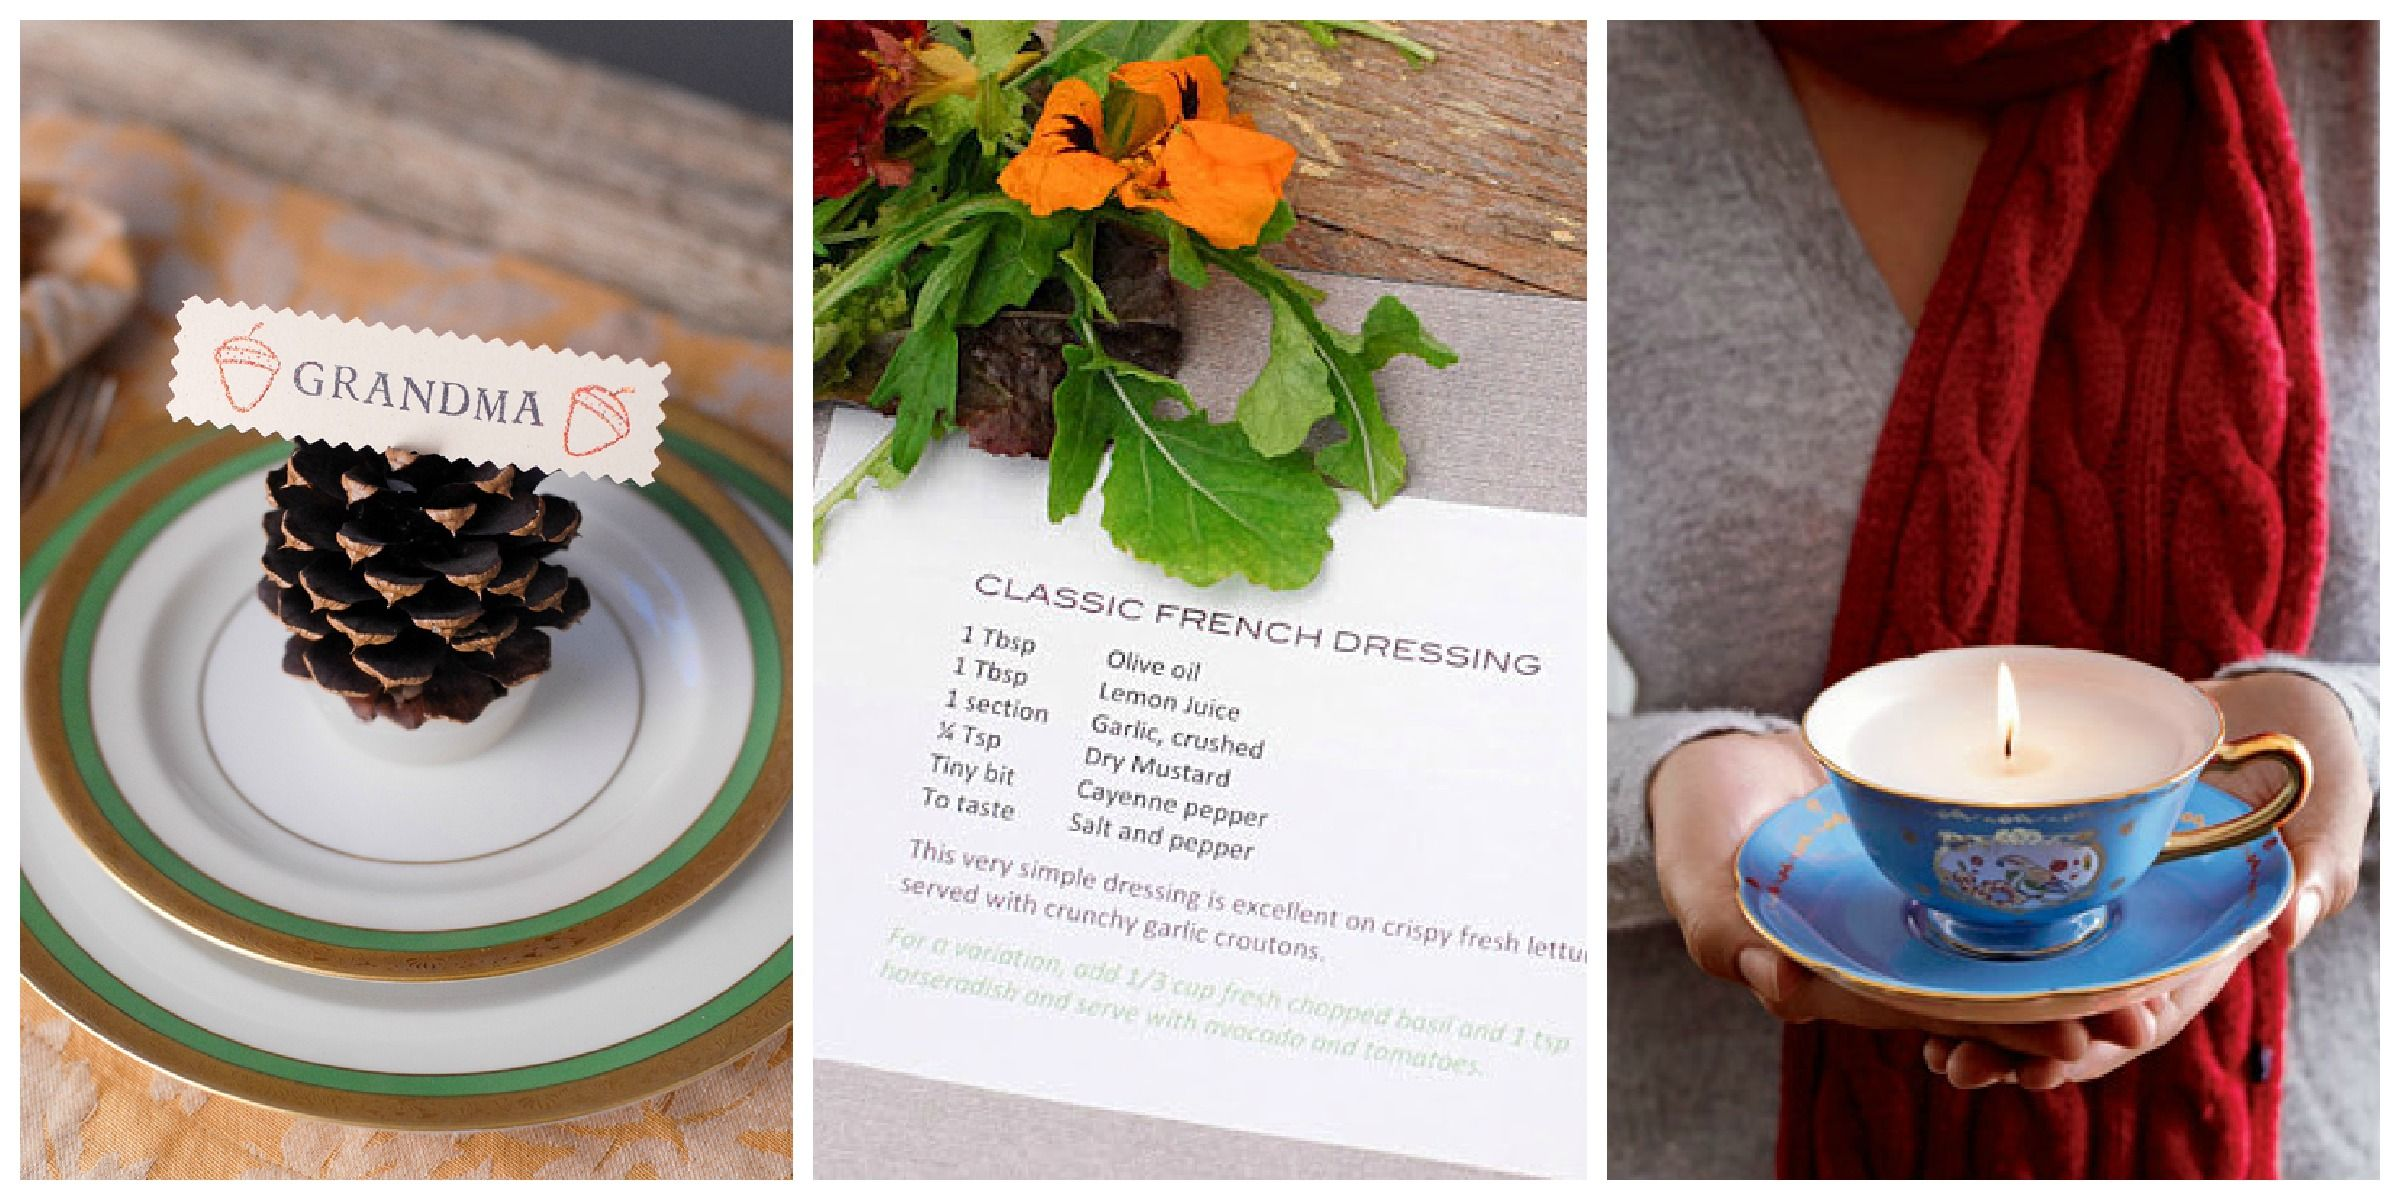 25 DIY Edible, Drinkable, Usable Holiday Gifts - boulderlocavore.com diy usable holiday gifts